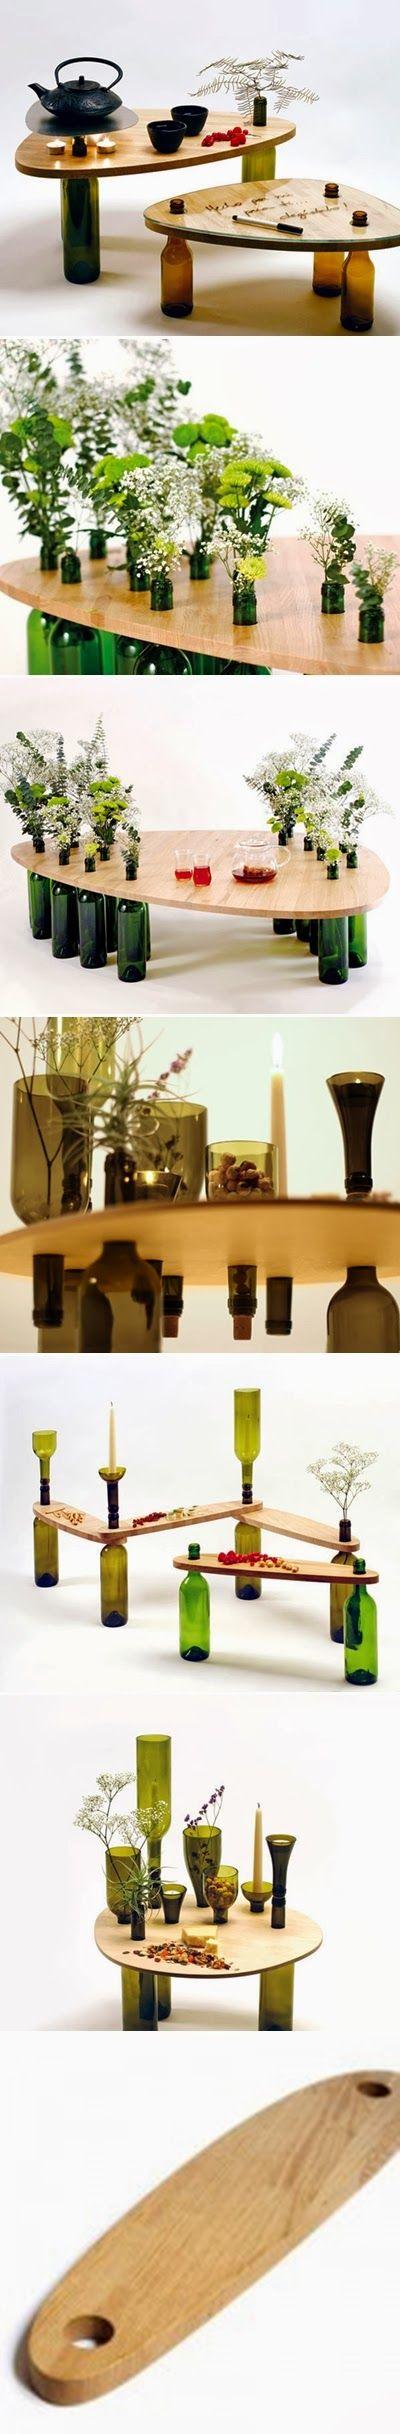 DIY : Used Wine Bottle Table | DIY & Crafts Tutorials